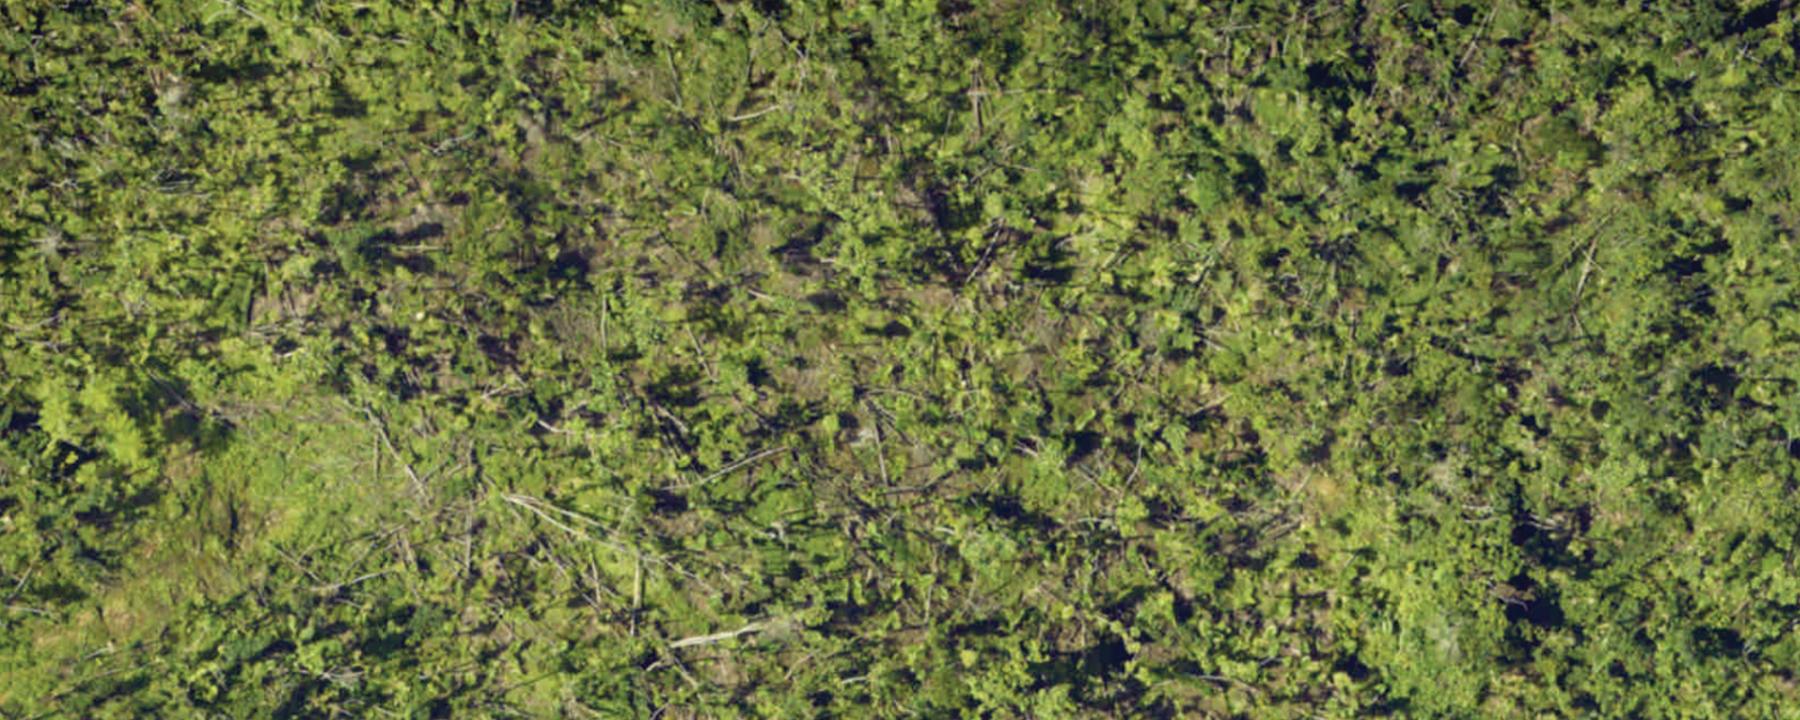 How Trees Fare in Big Hurricanes | The Scientist Magazine®